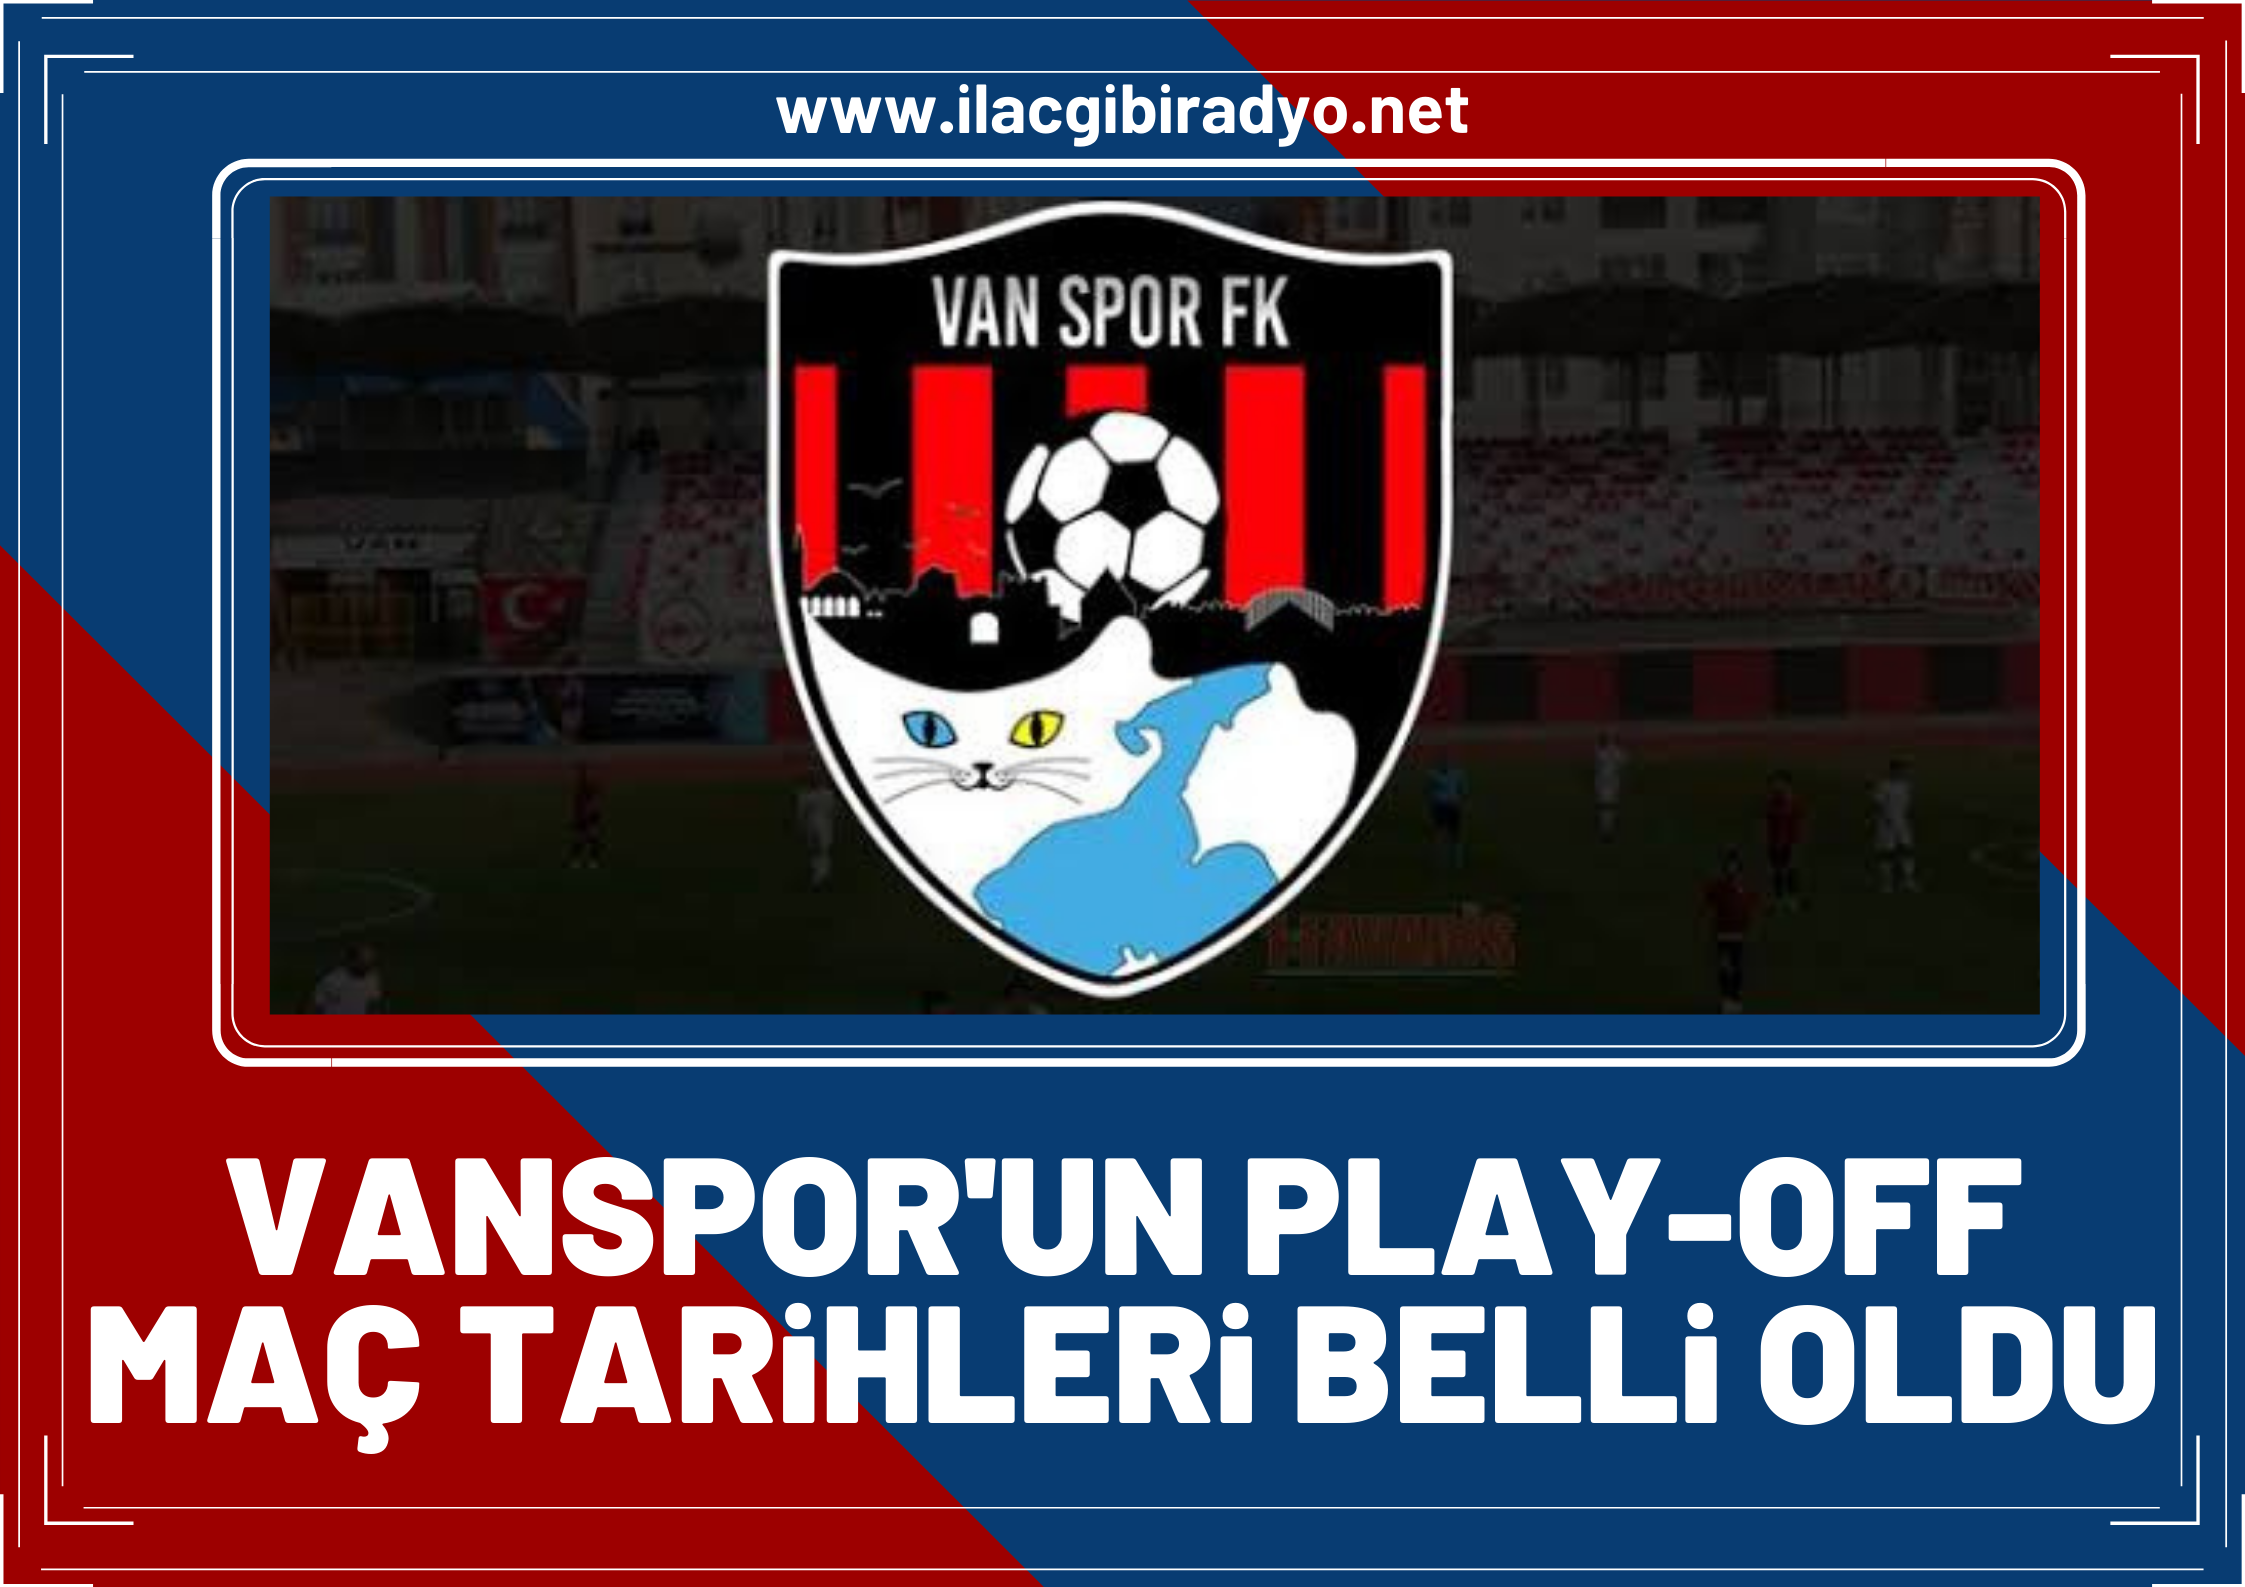 Vanspor'un play-off maç tarihleri belli oldu